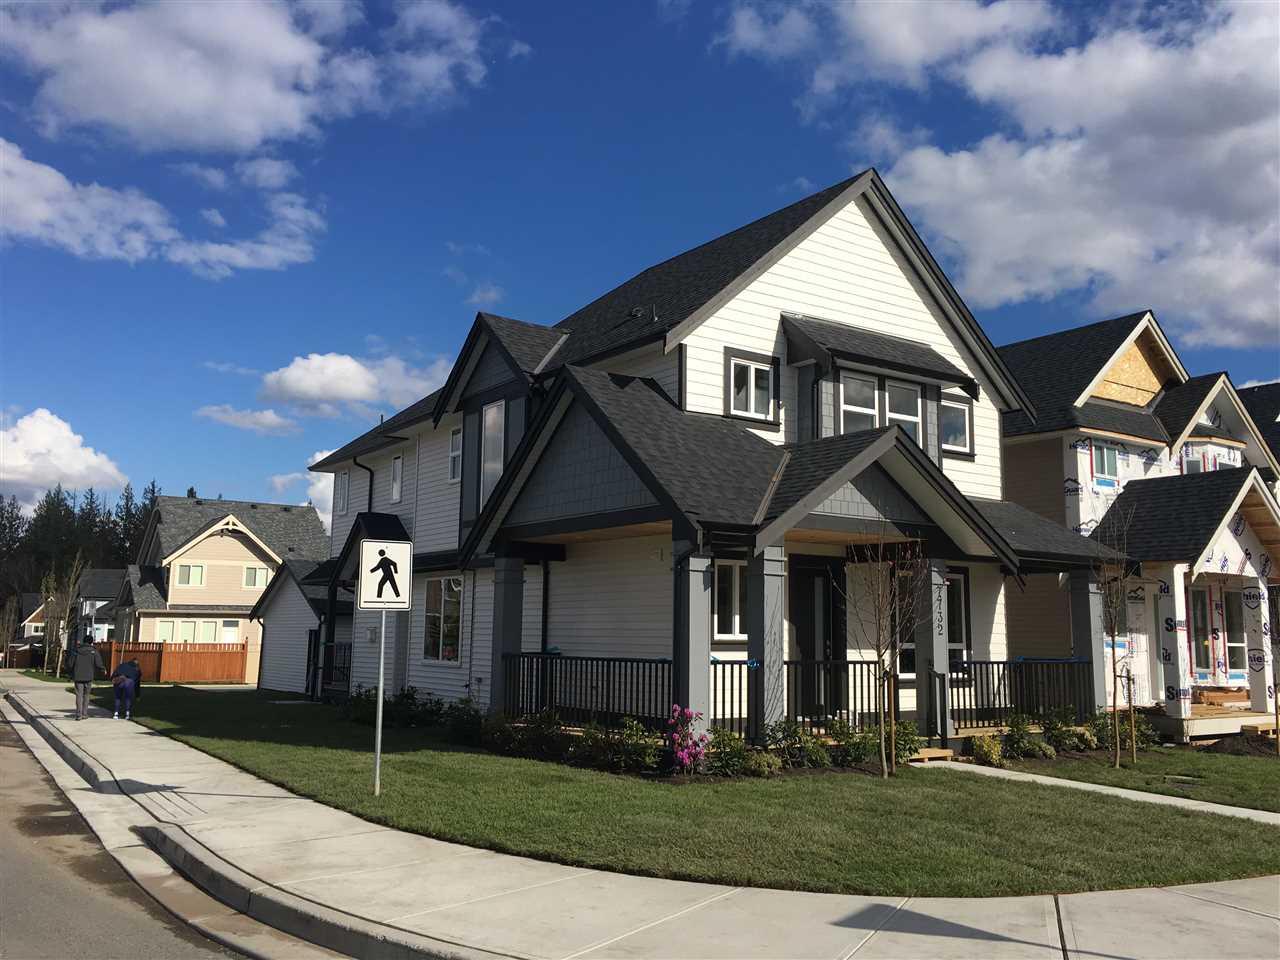 7732 211 STREET, Langley, BC v2y 0w5